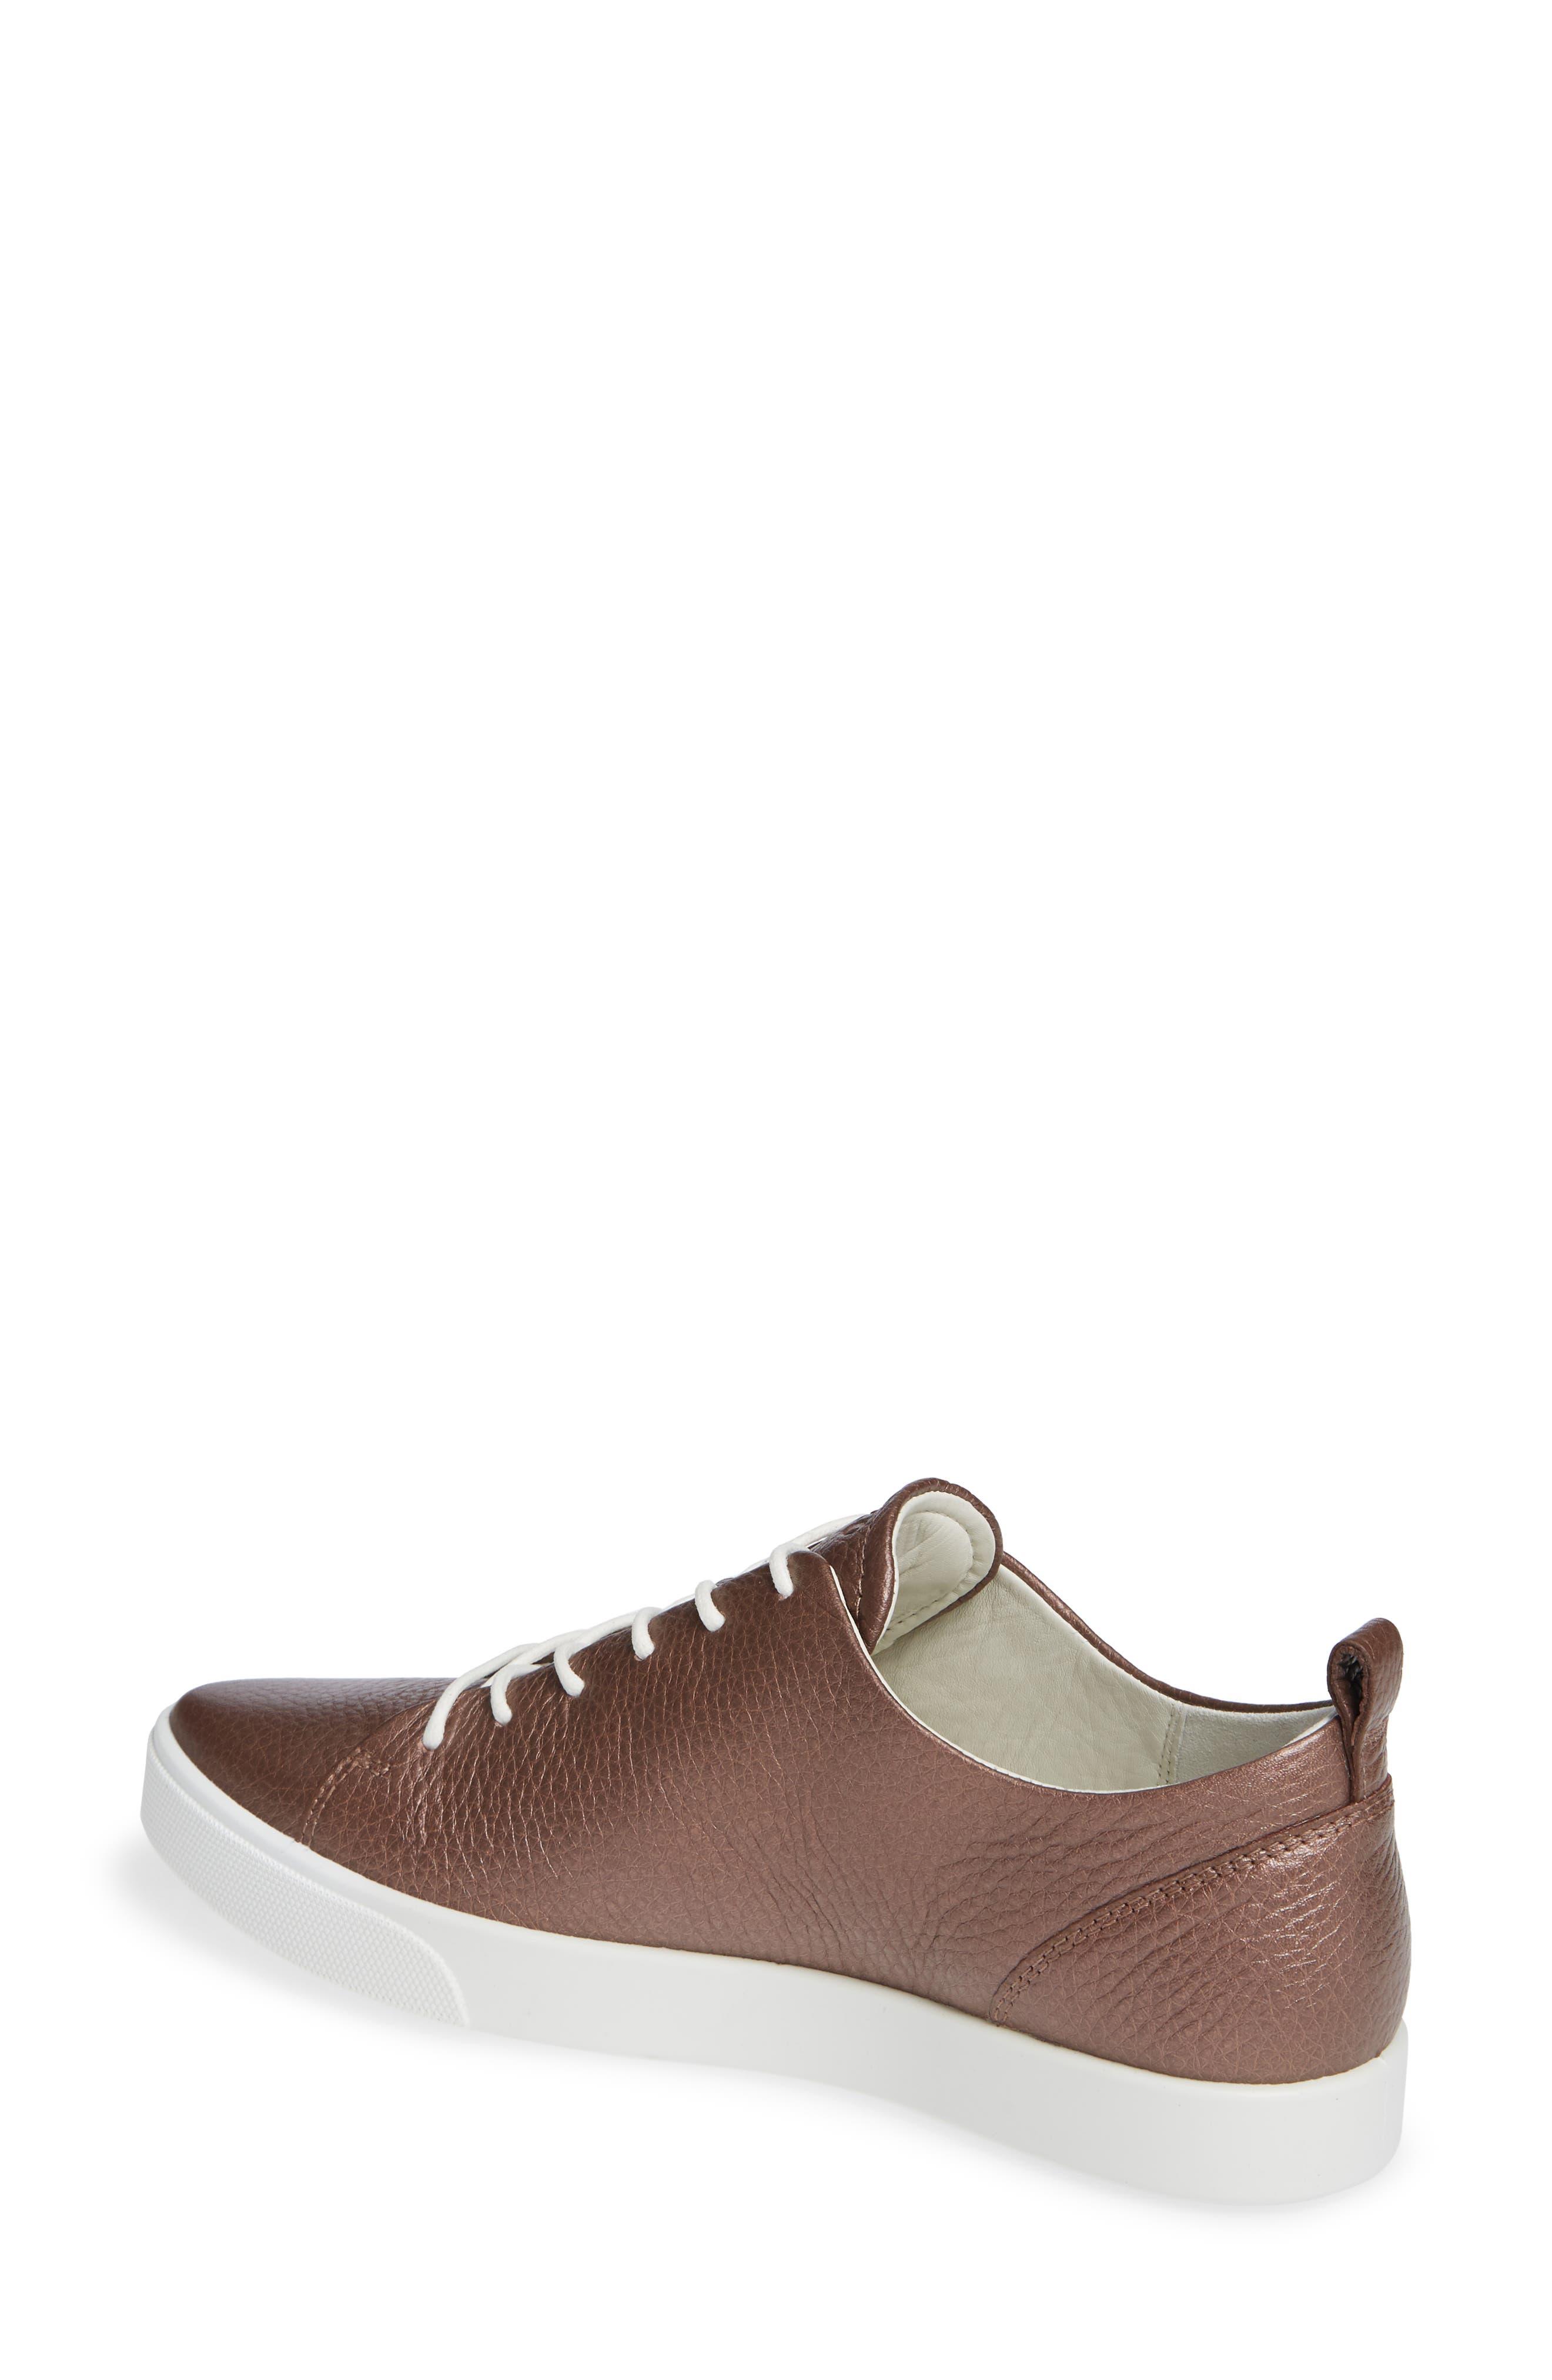 Gillian Sneaker,                             Alternate thumbnail 2, color,                             DEEP TAUPE/ BRONZE LEATHER